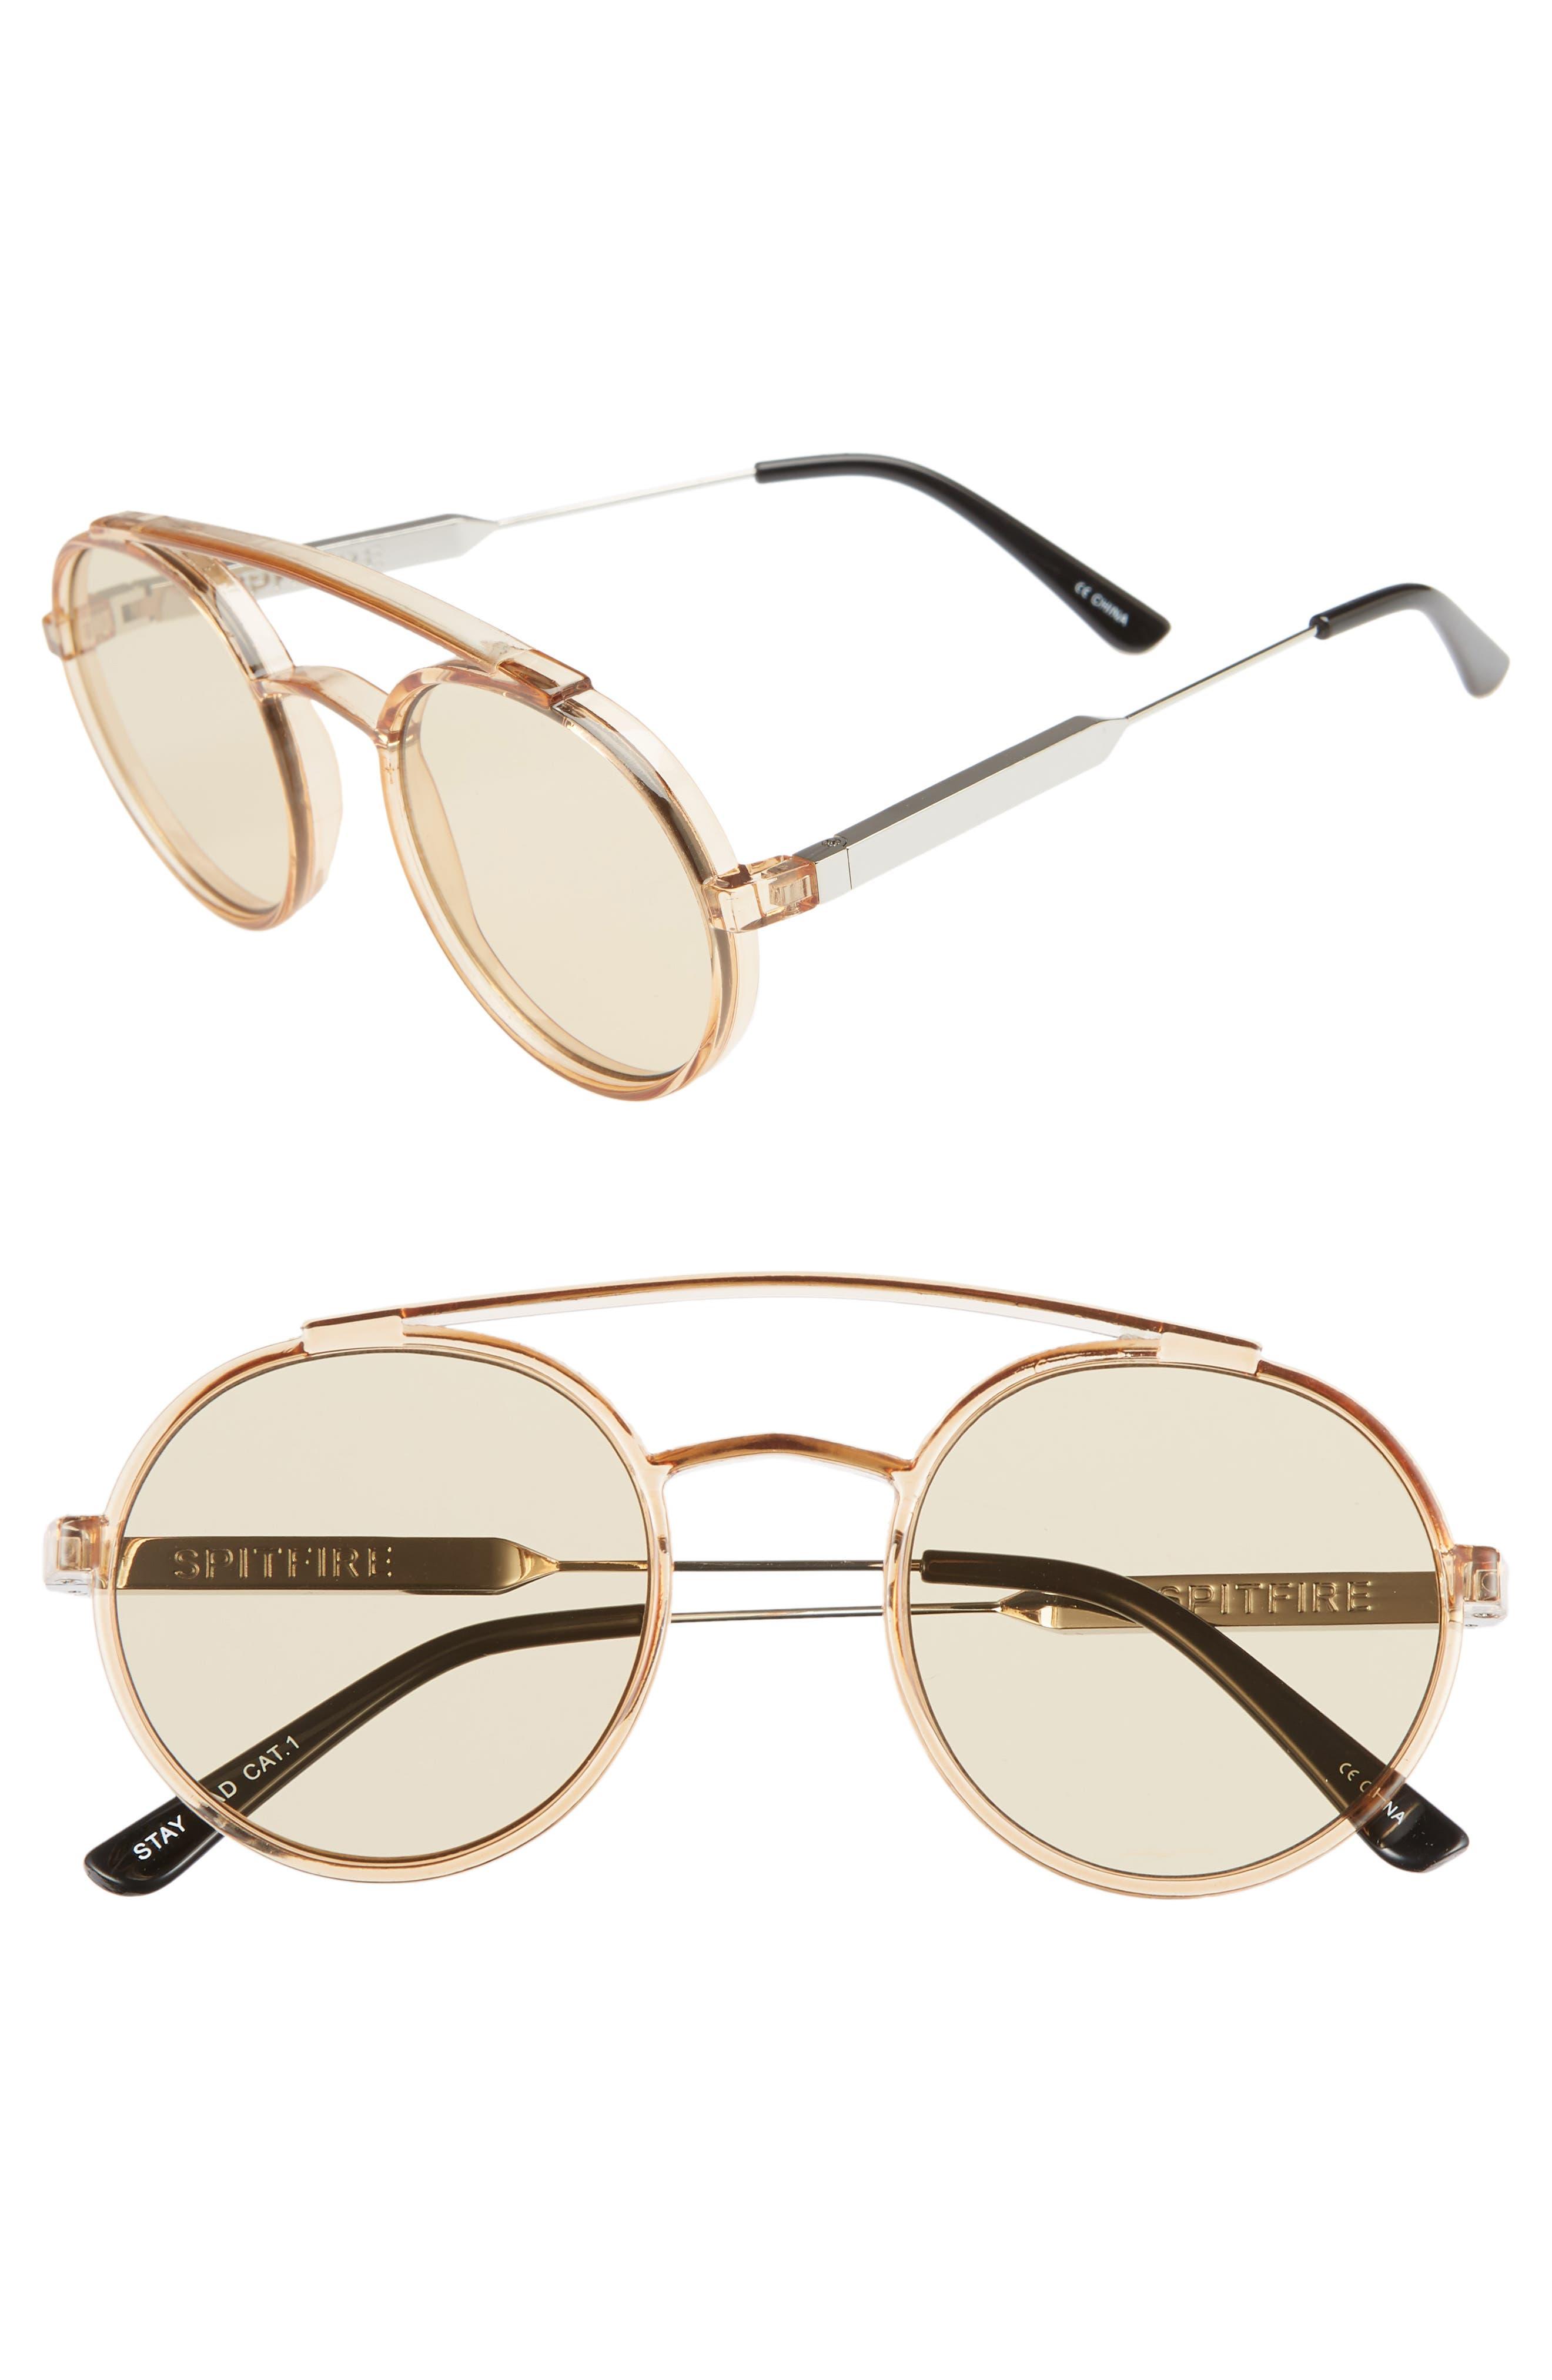 SPITFIRE Stay Rad 53Mm Round Sunglasses - Tan/ Tan